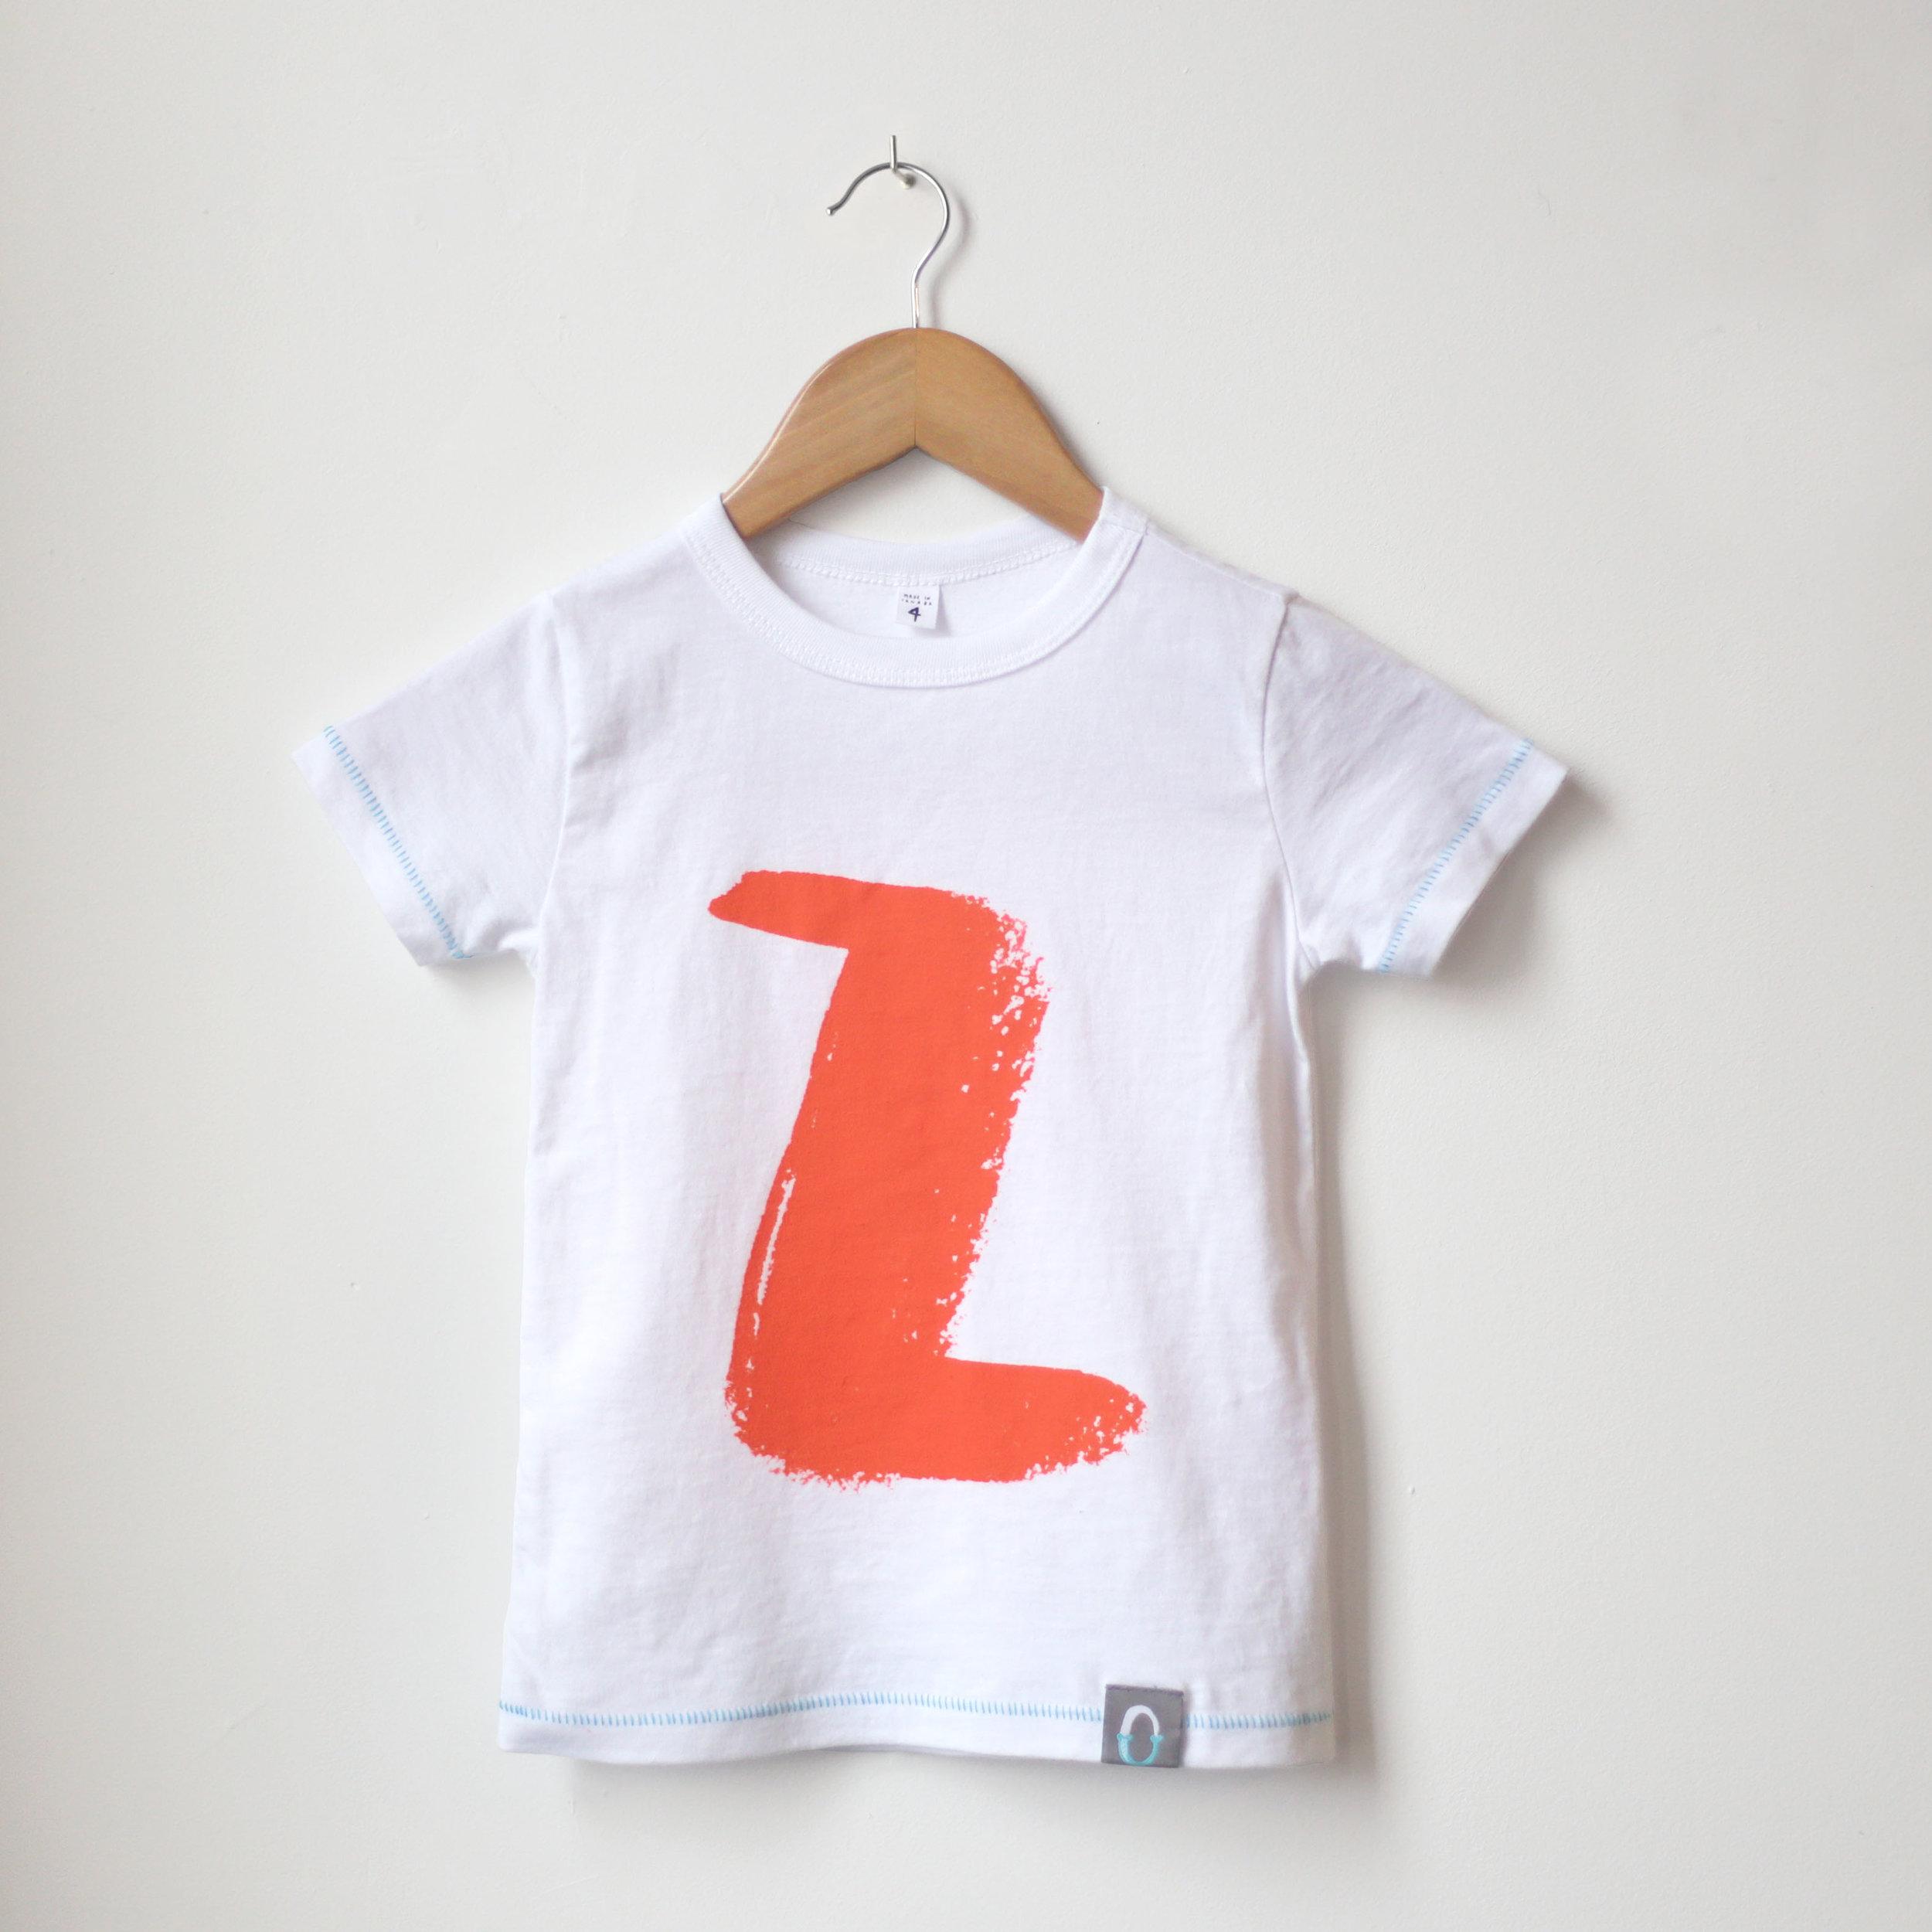 Oliver_Jeffers_child_z_shirt.jpg